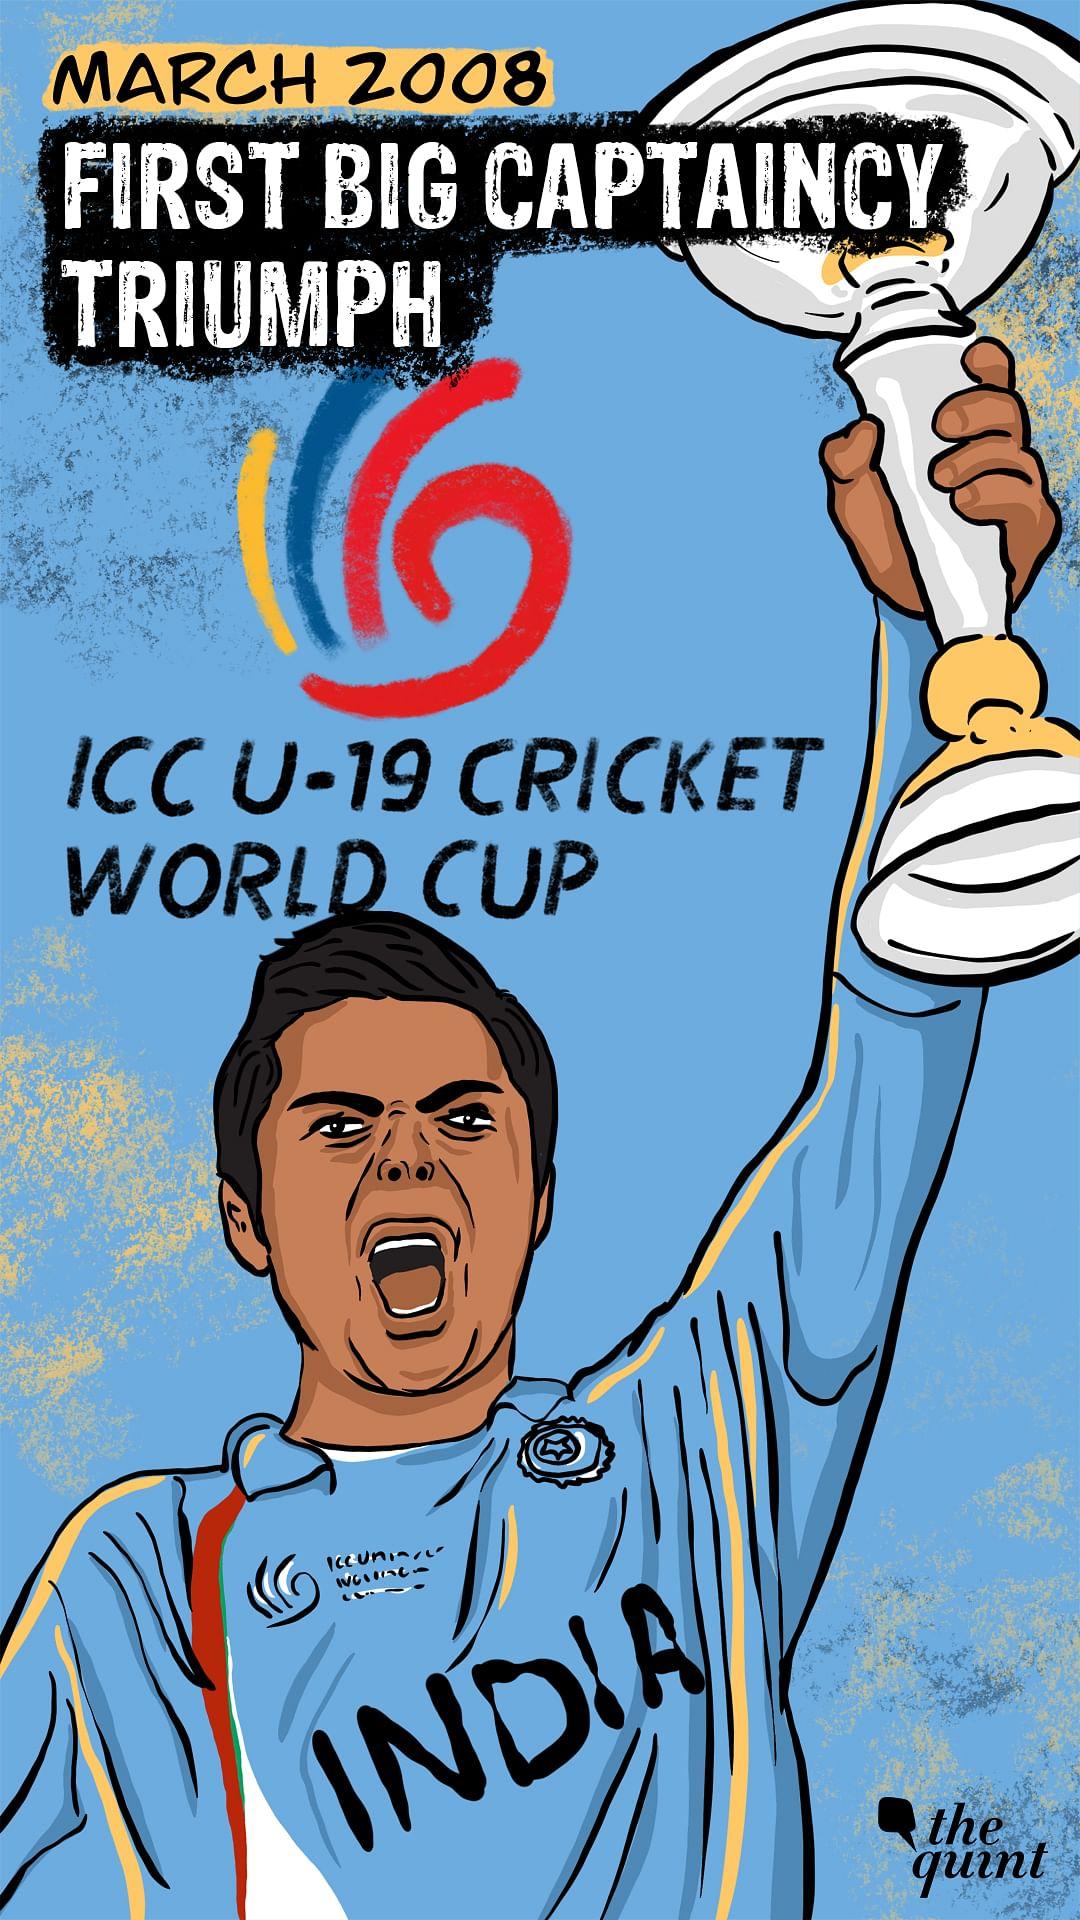 Happy Birthday, Virat! The Delhi Boy Who Became Cricket 'King'